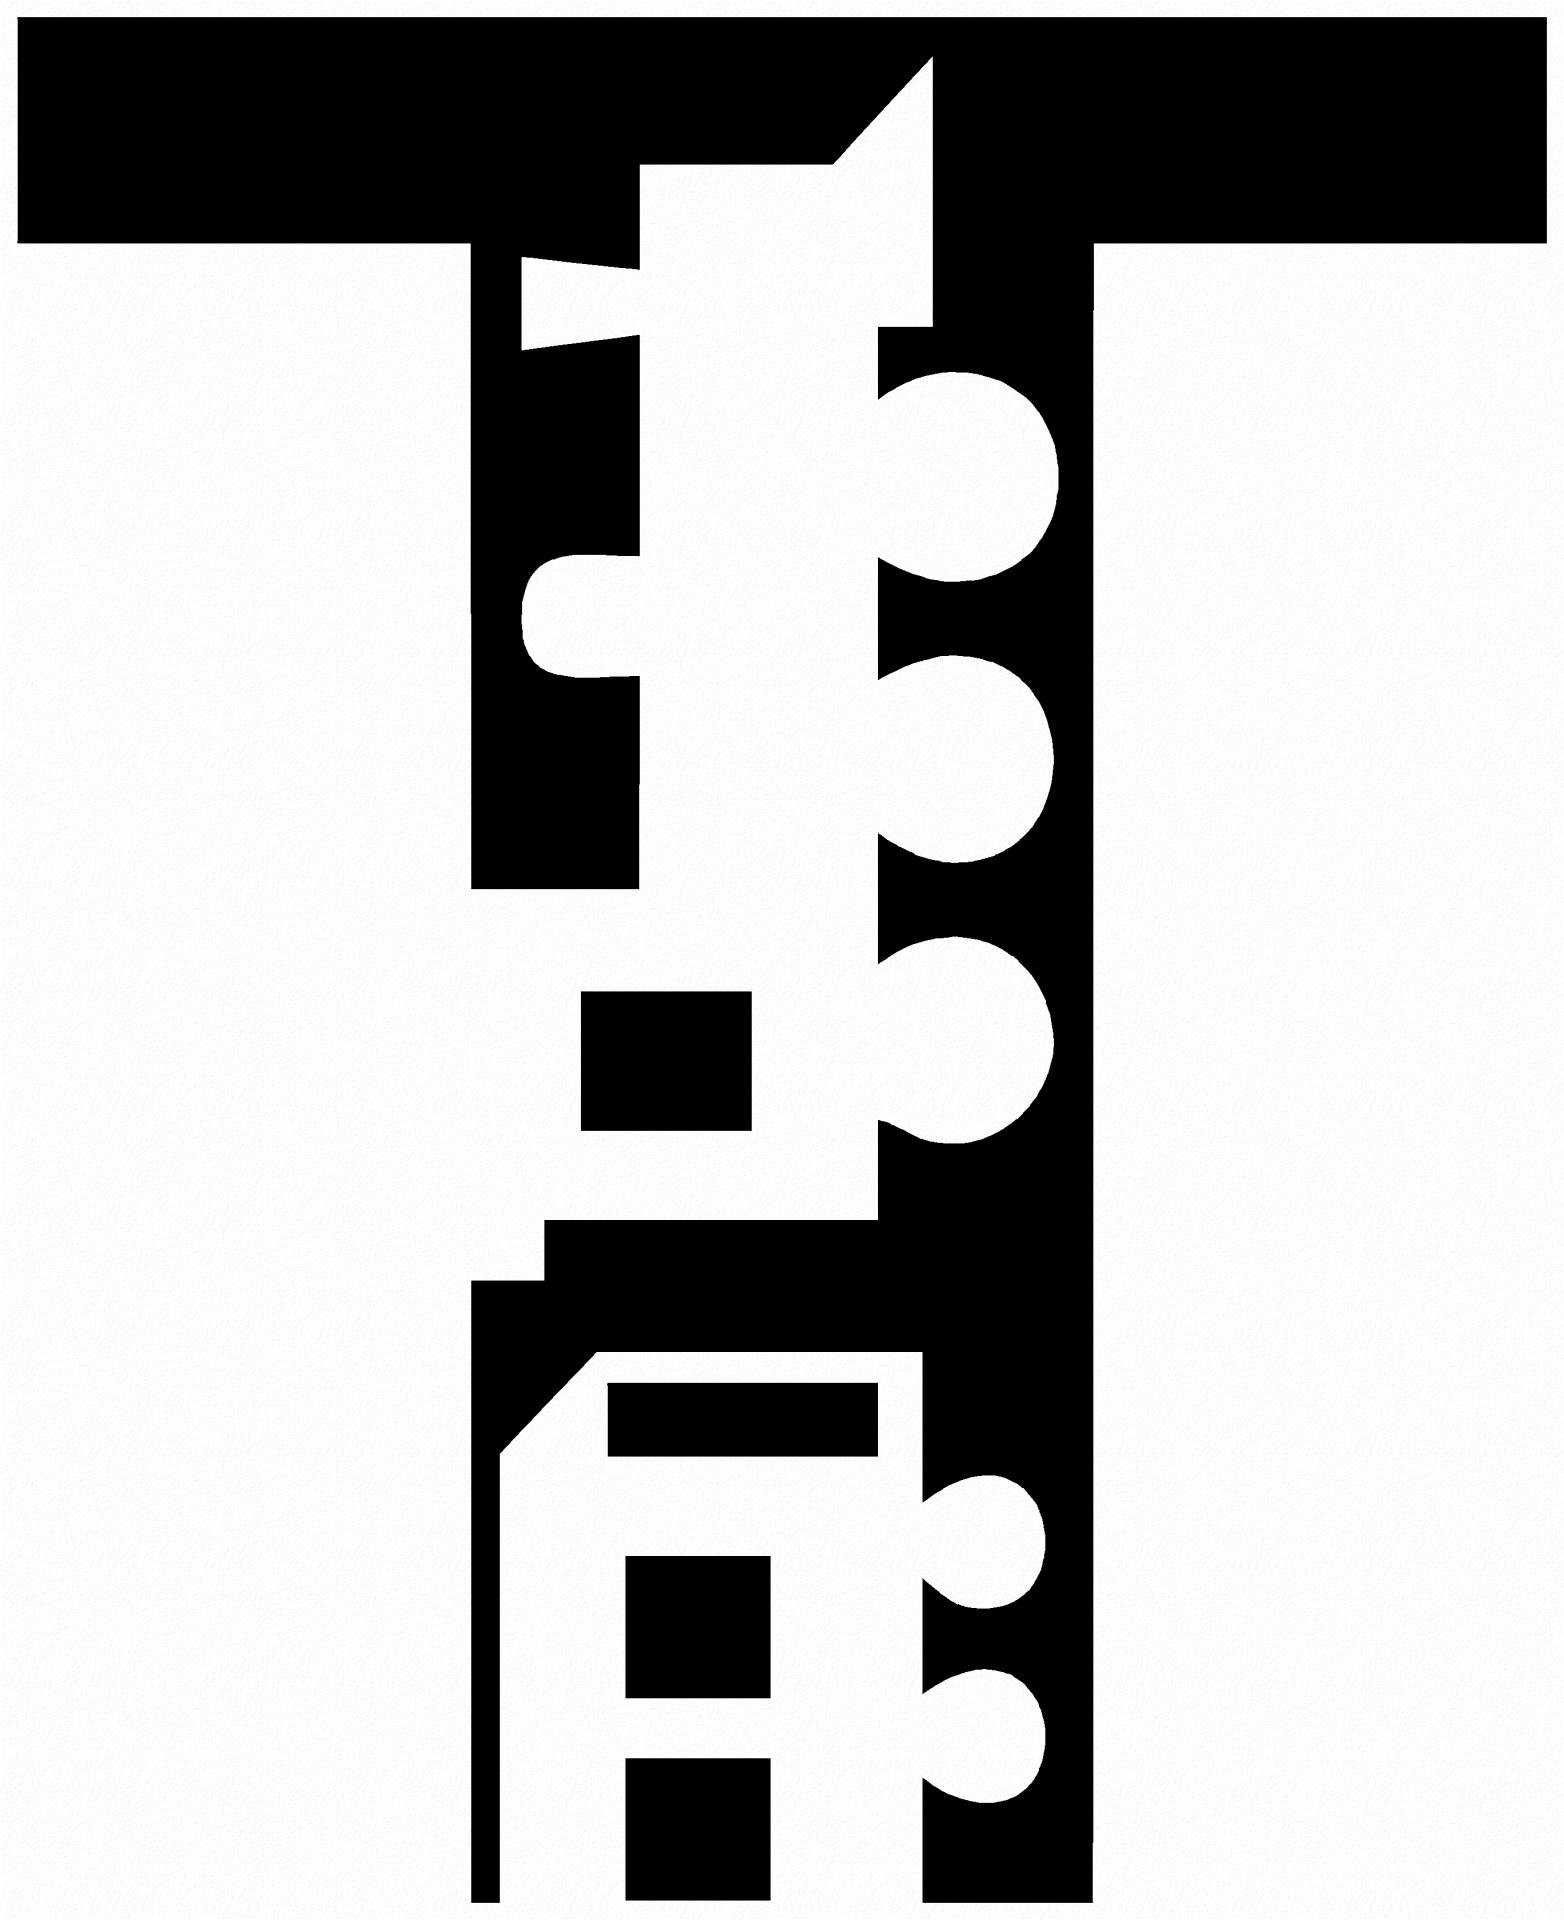 1564x1920 Alphabet Silhouette Letter T Free Stock Photo